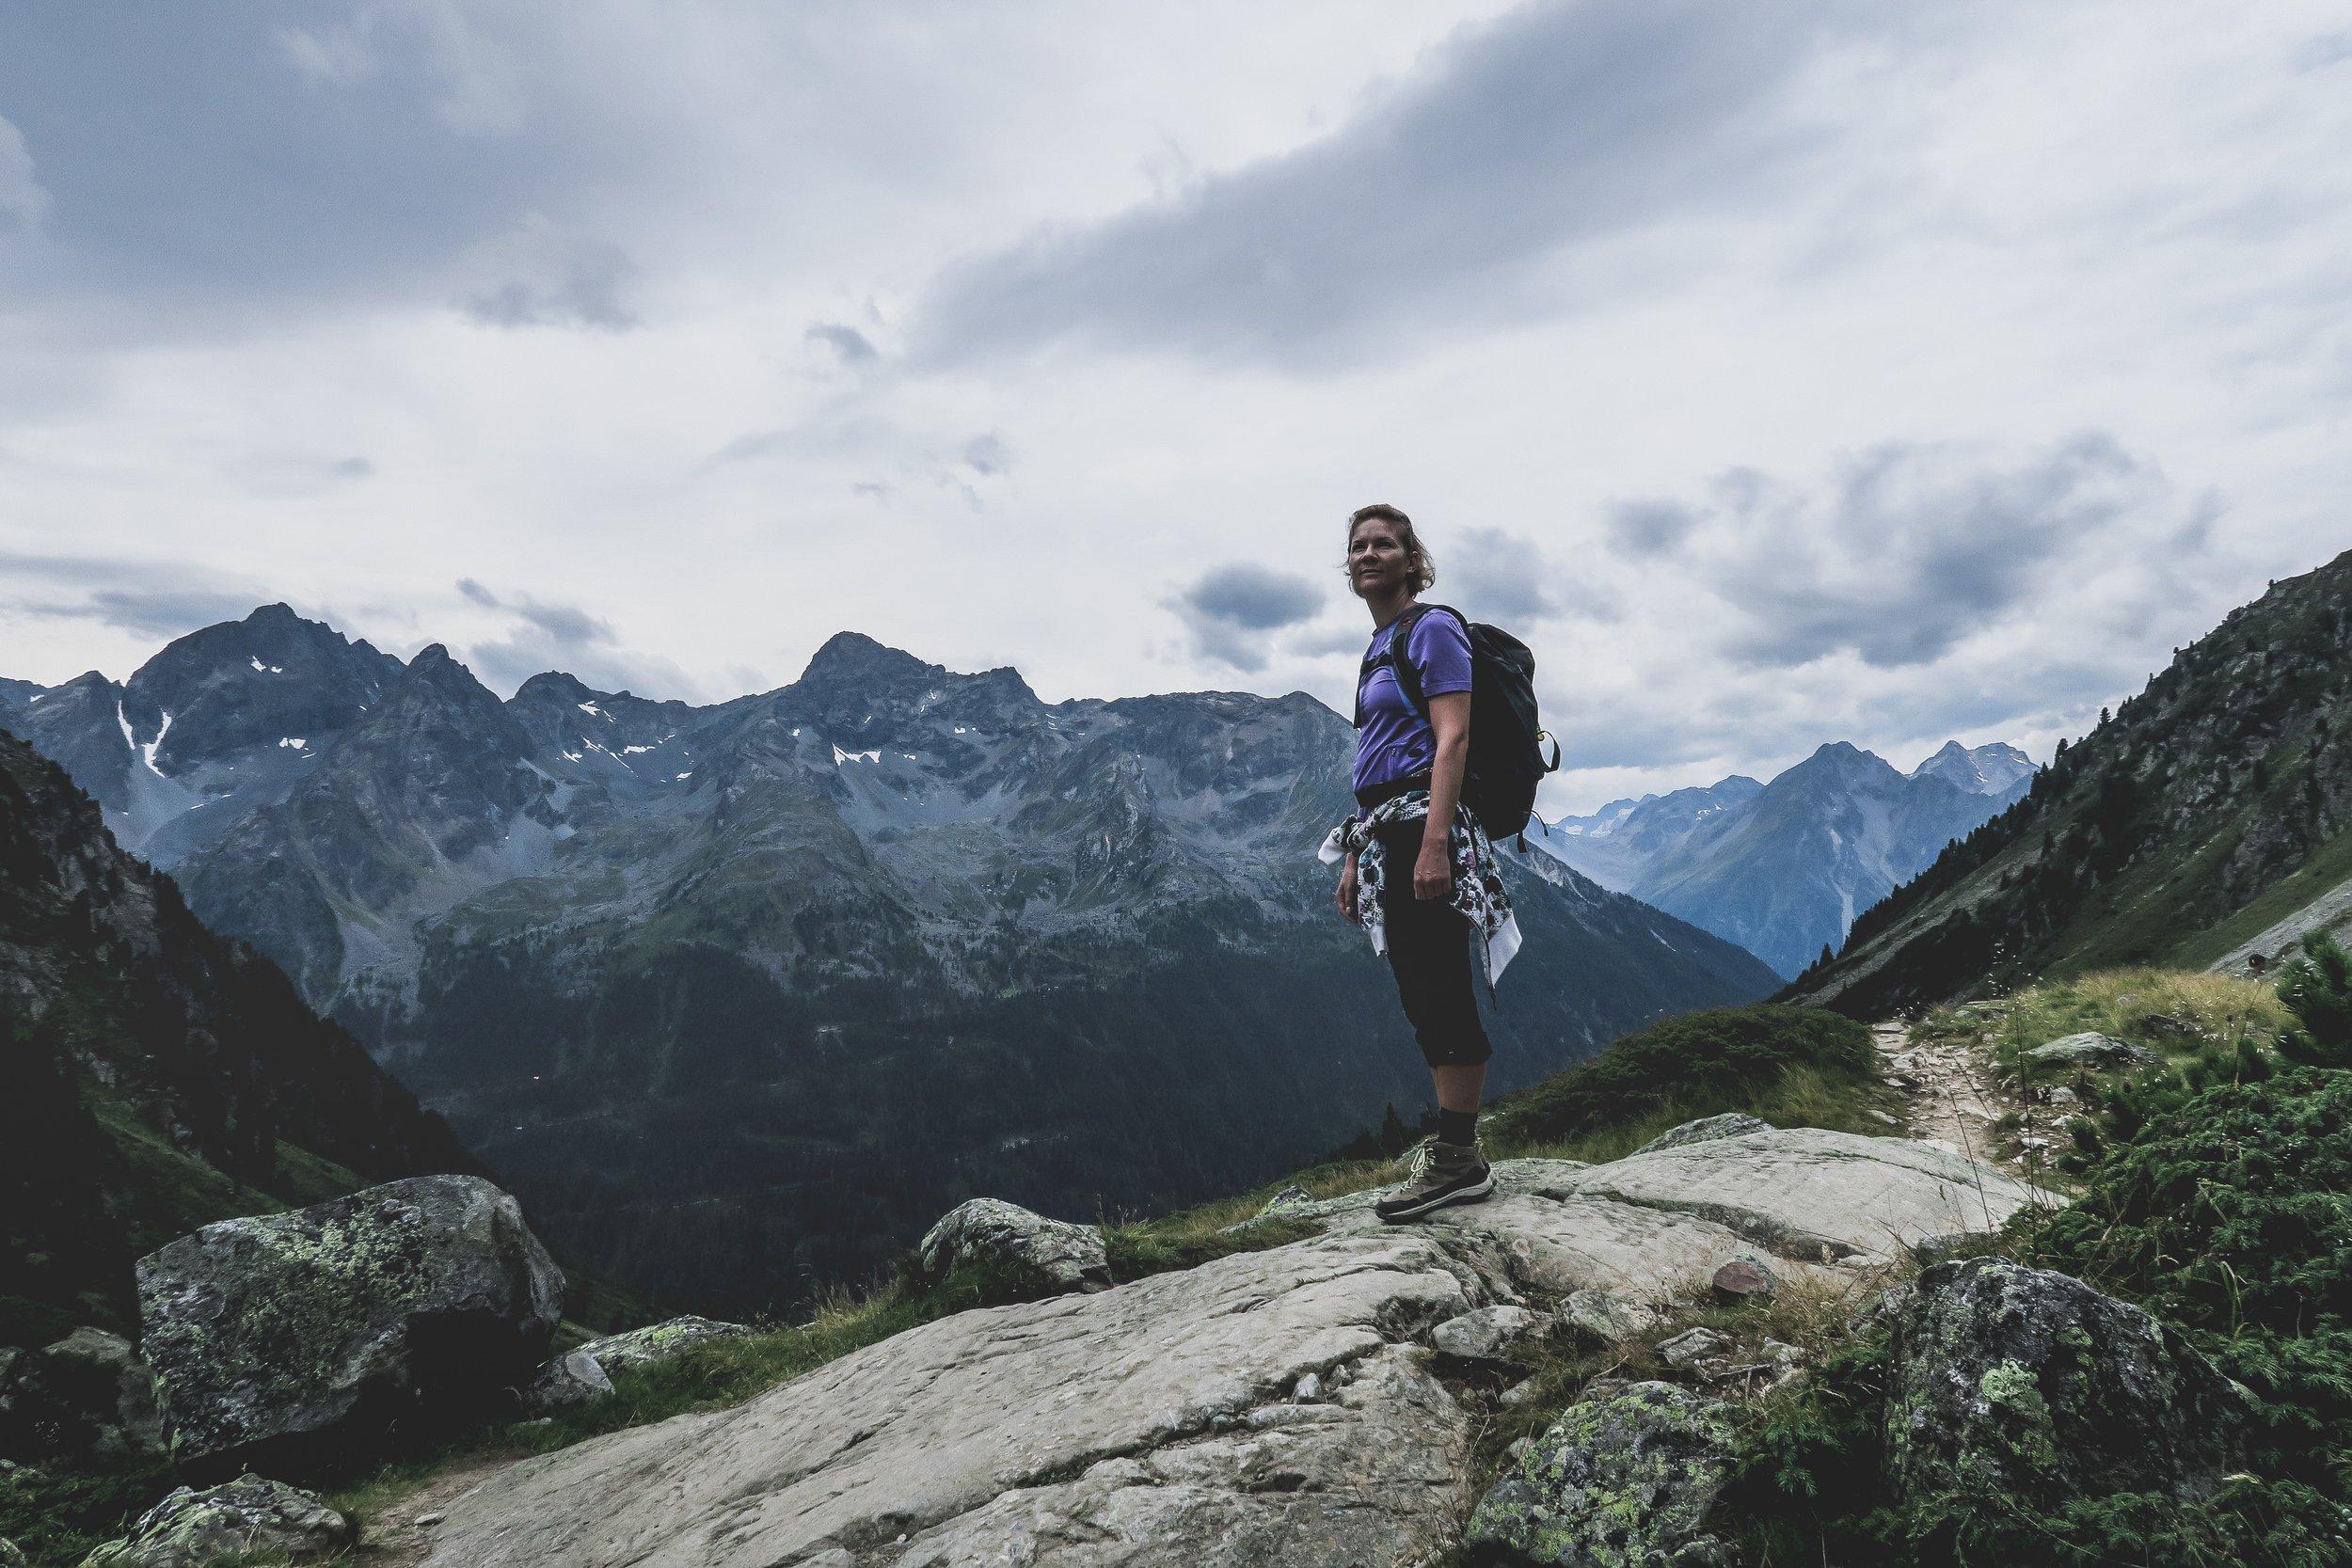 Wanderer, berge, Bergpanorama, blauer Himmel.jpg